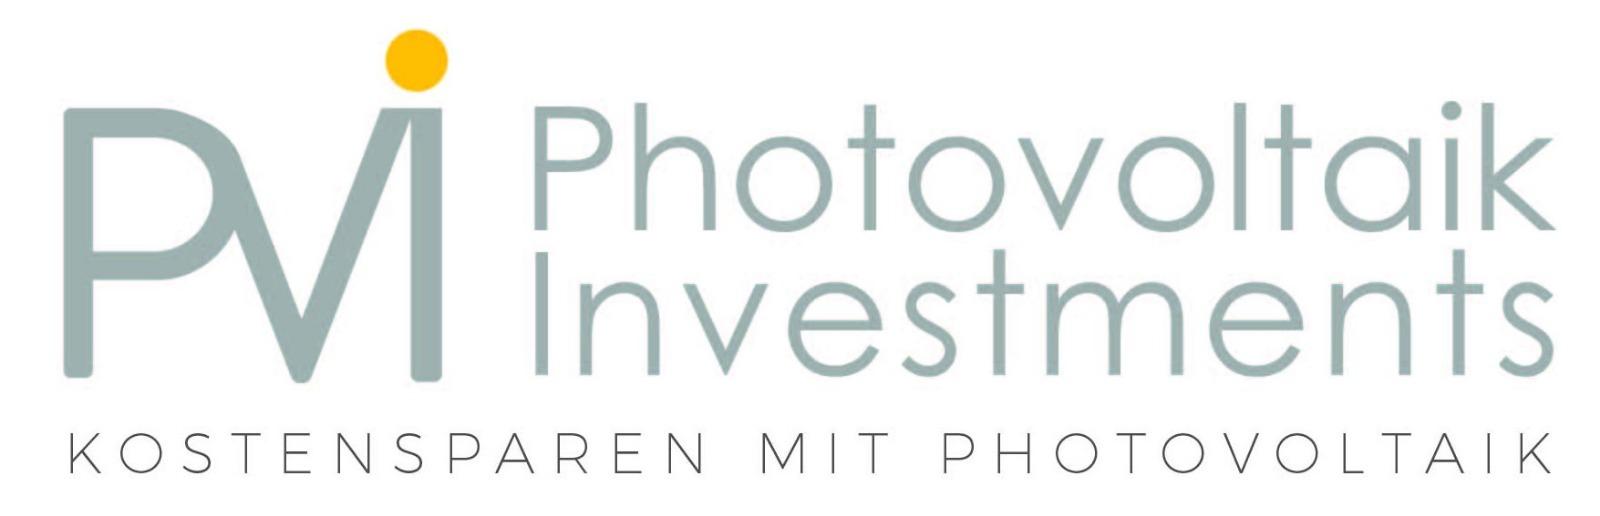 PVI I Photovoltaik Investments